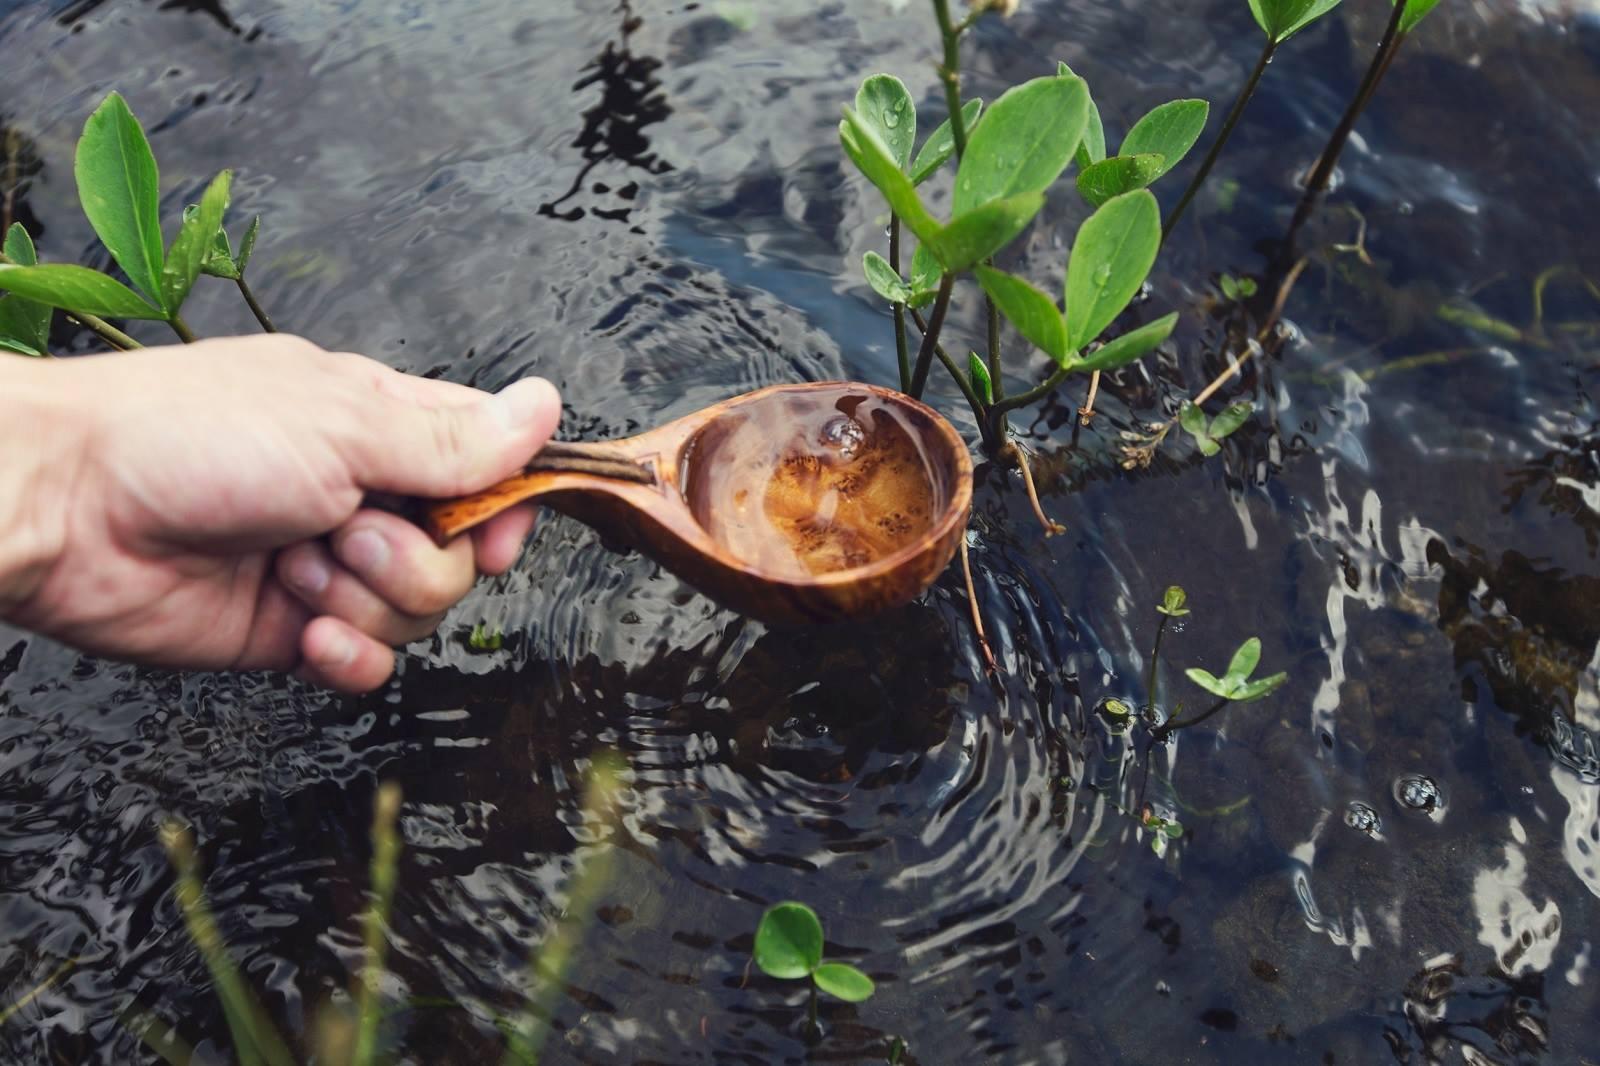 Как охраняют воду от загрязнения